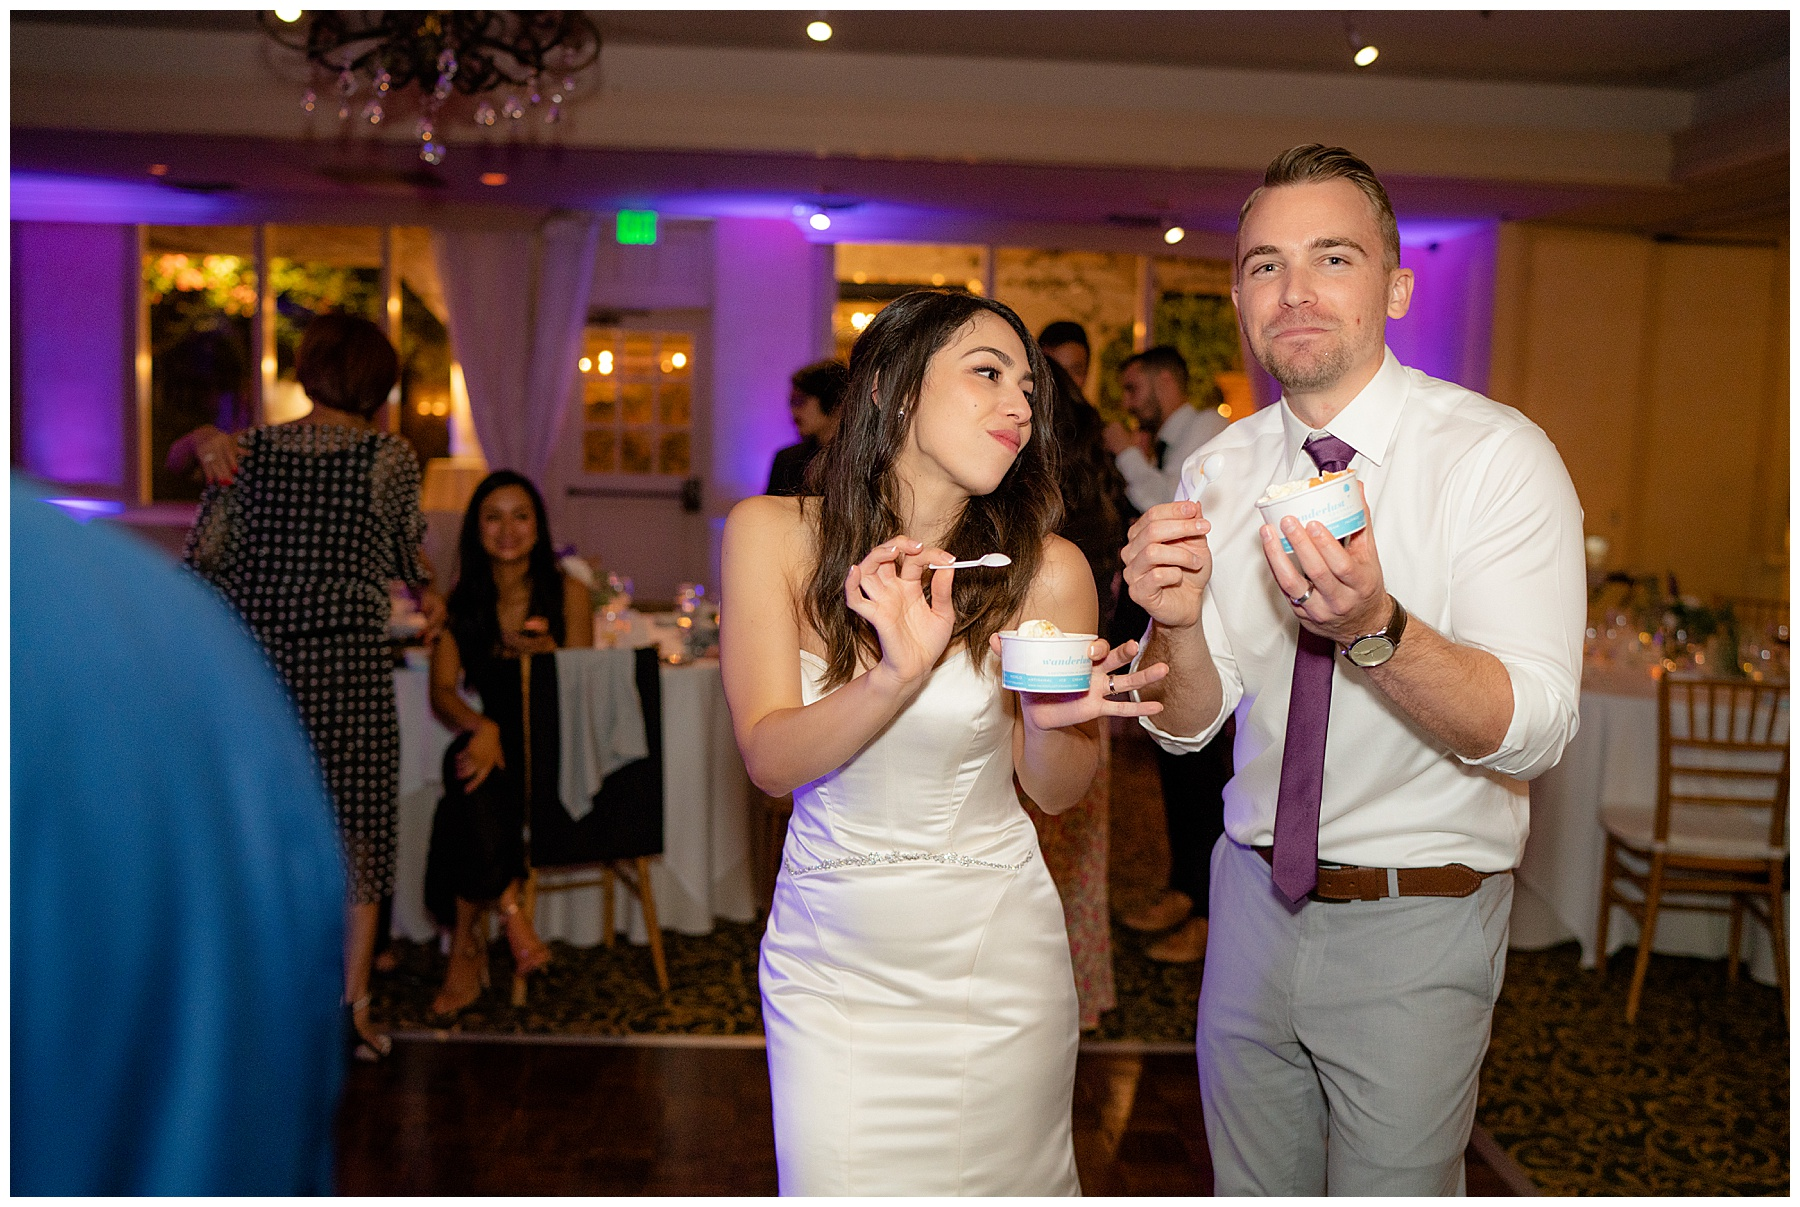 ice cream cart wedding catering calamigos equestrian center wedding